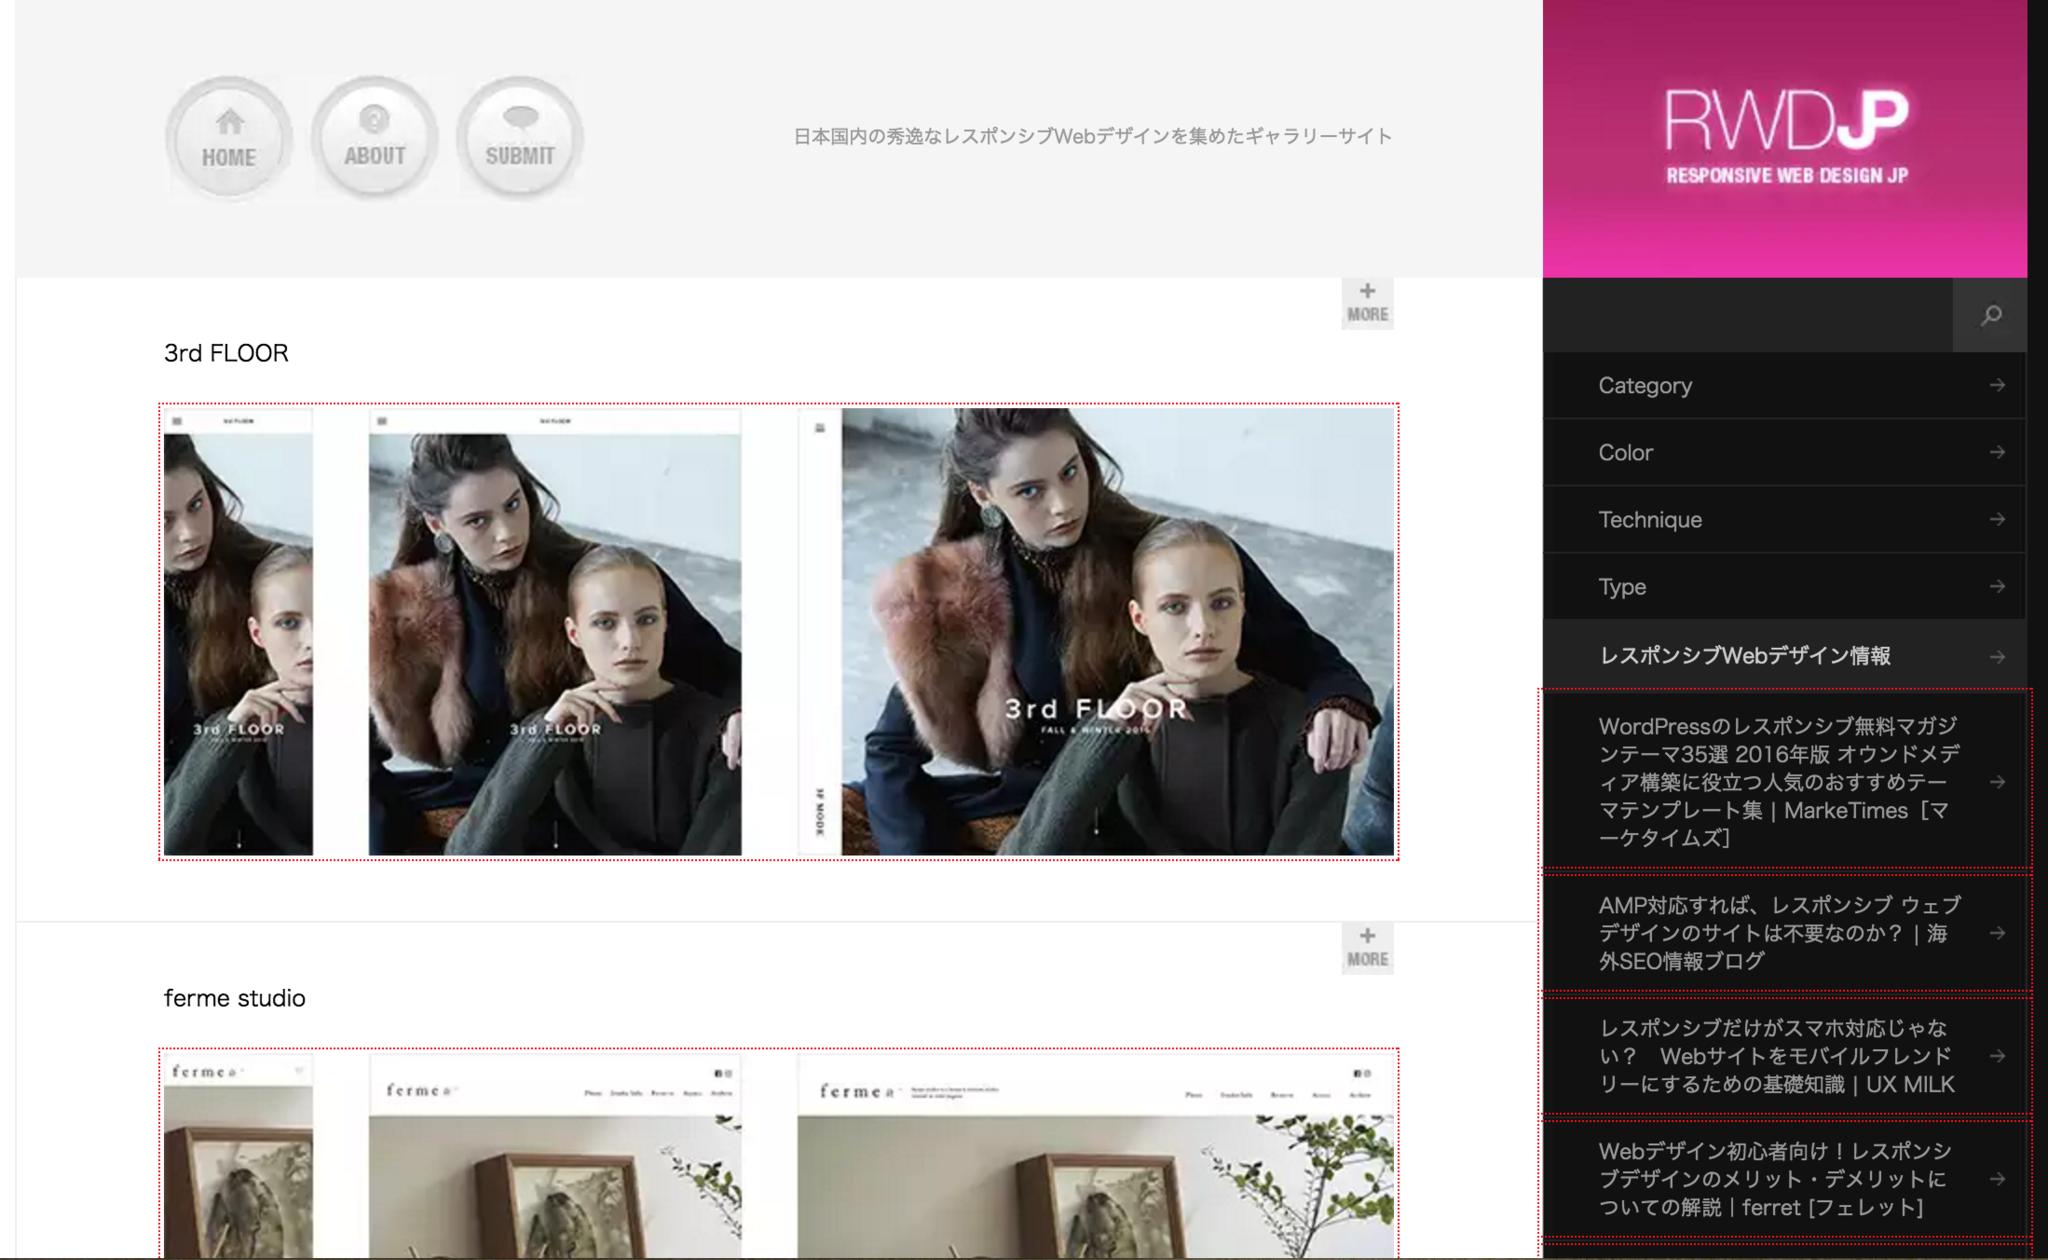 Responsive_Web_Design_JP.png